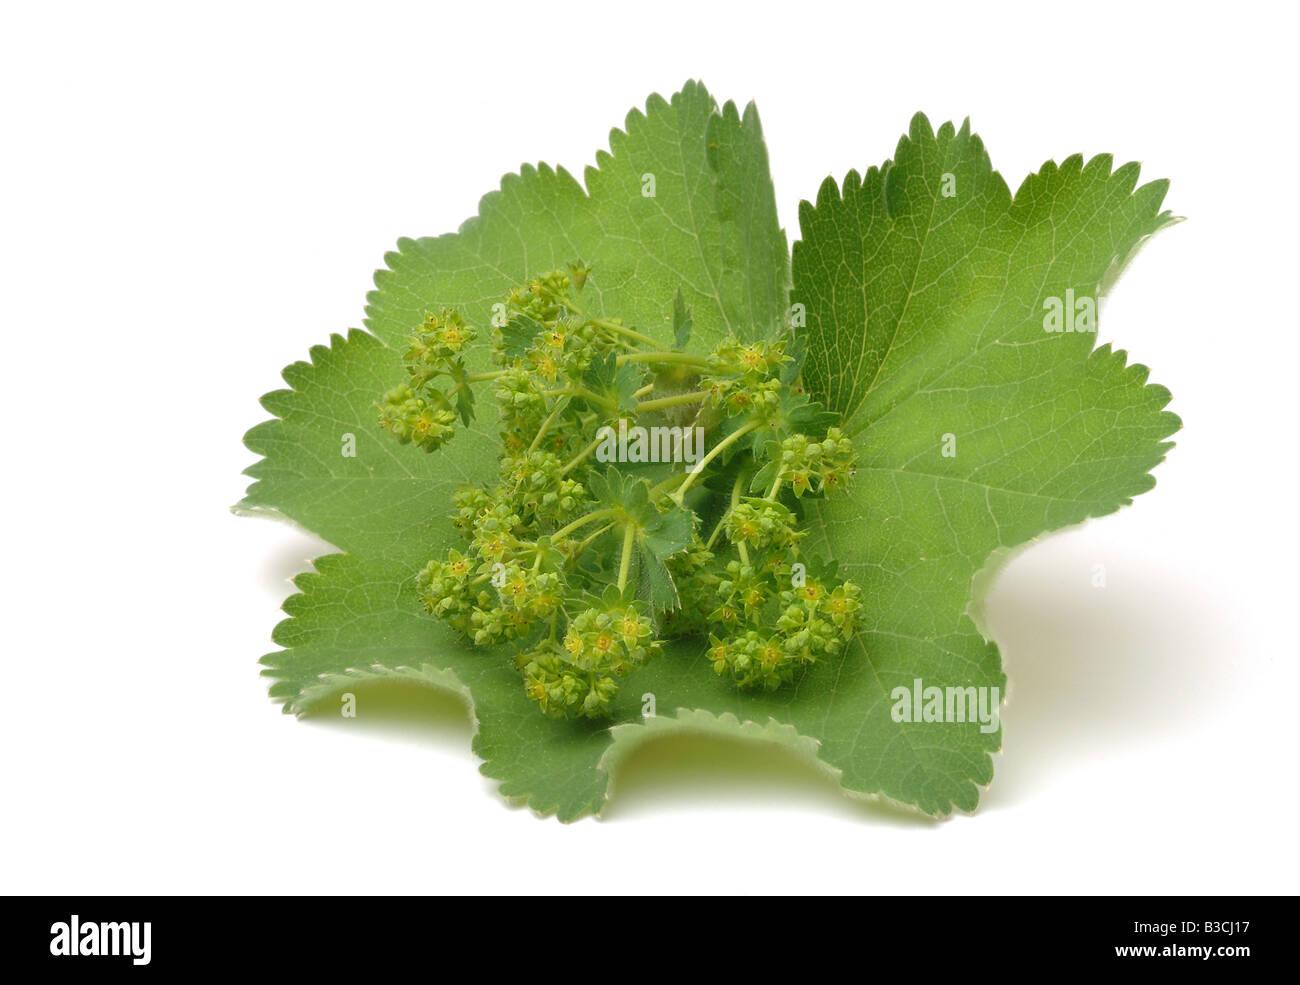 medicinal plant Alchemilla Lady s mantle Alchemilla vulgaris - Stock Image